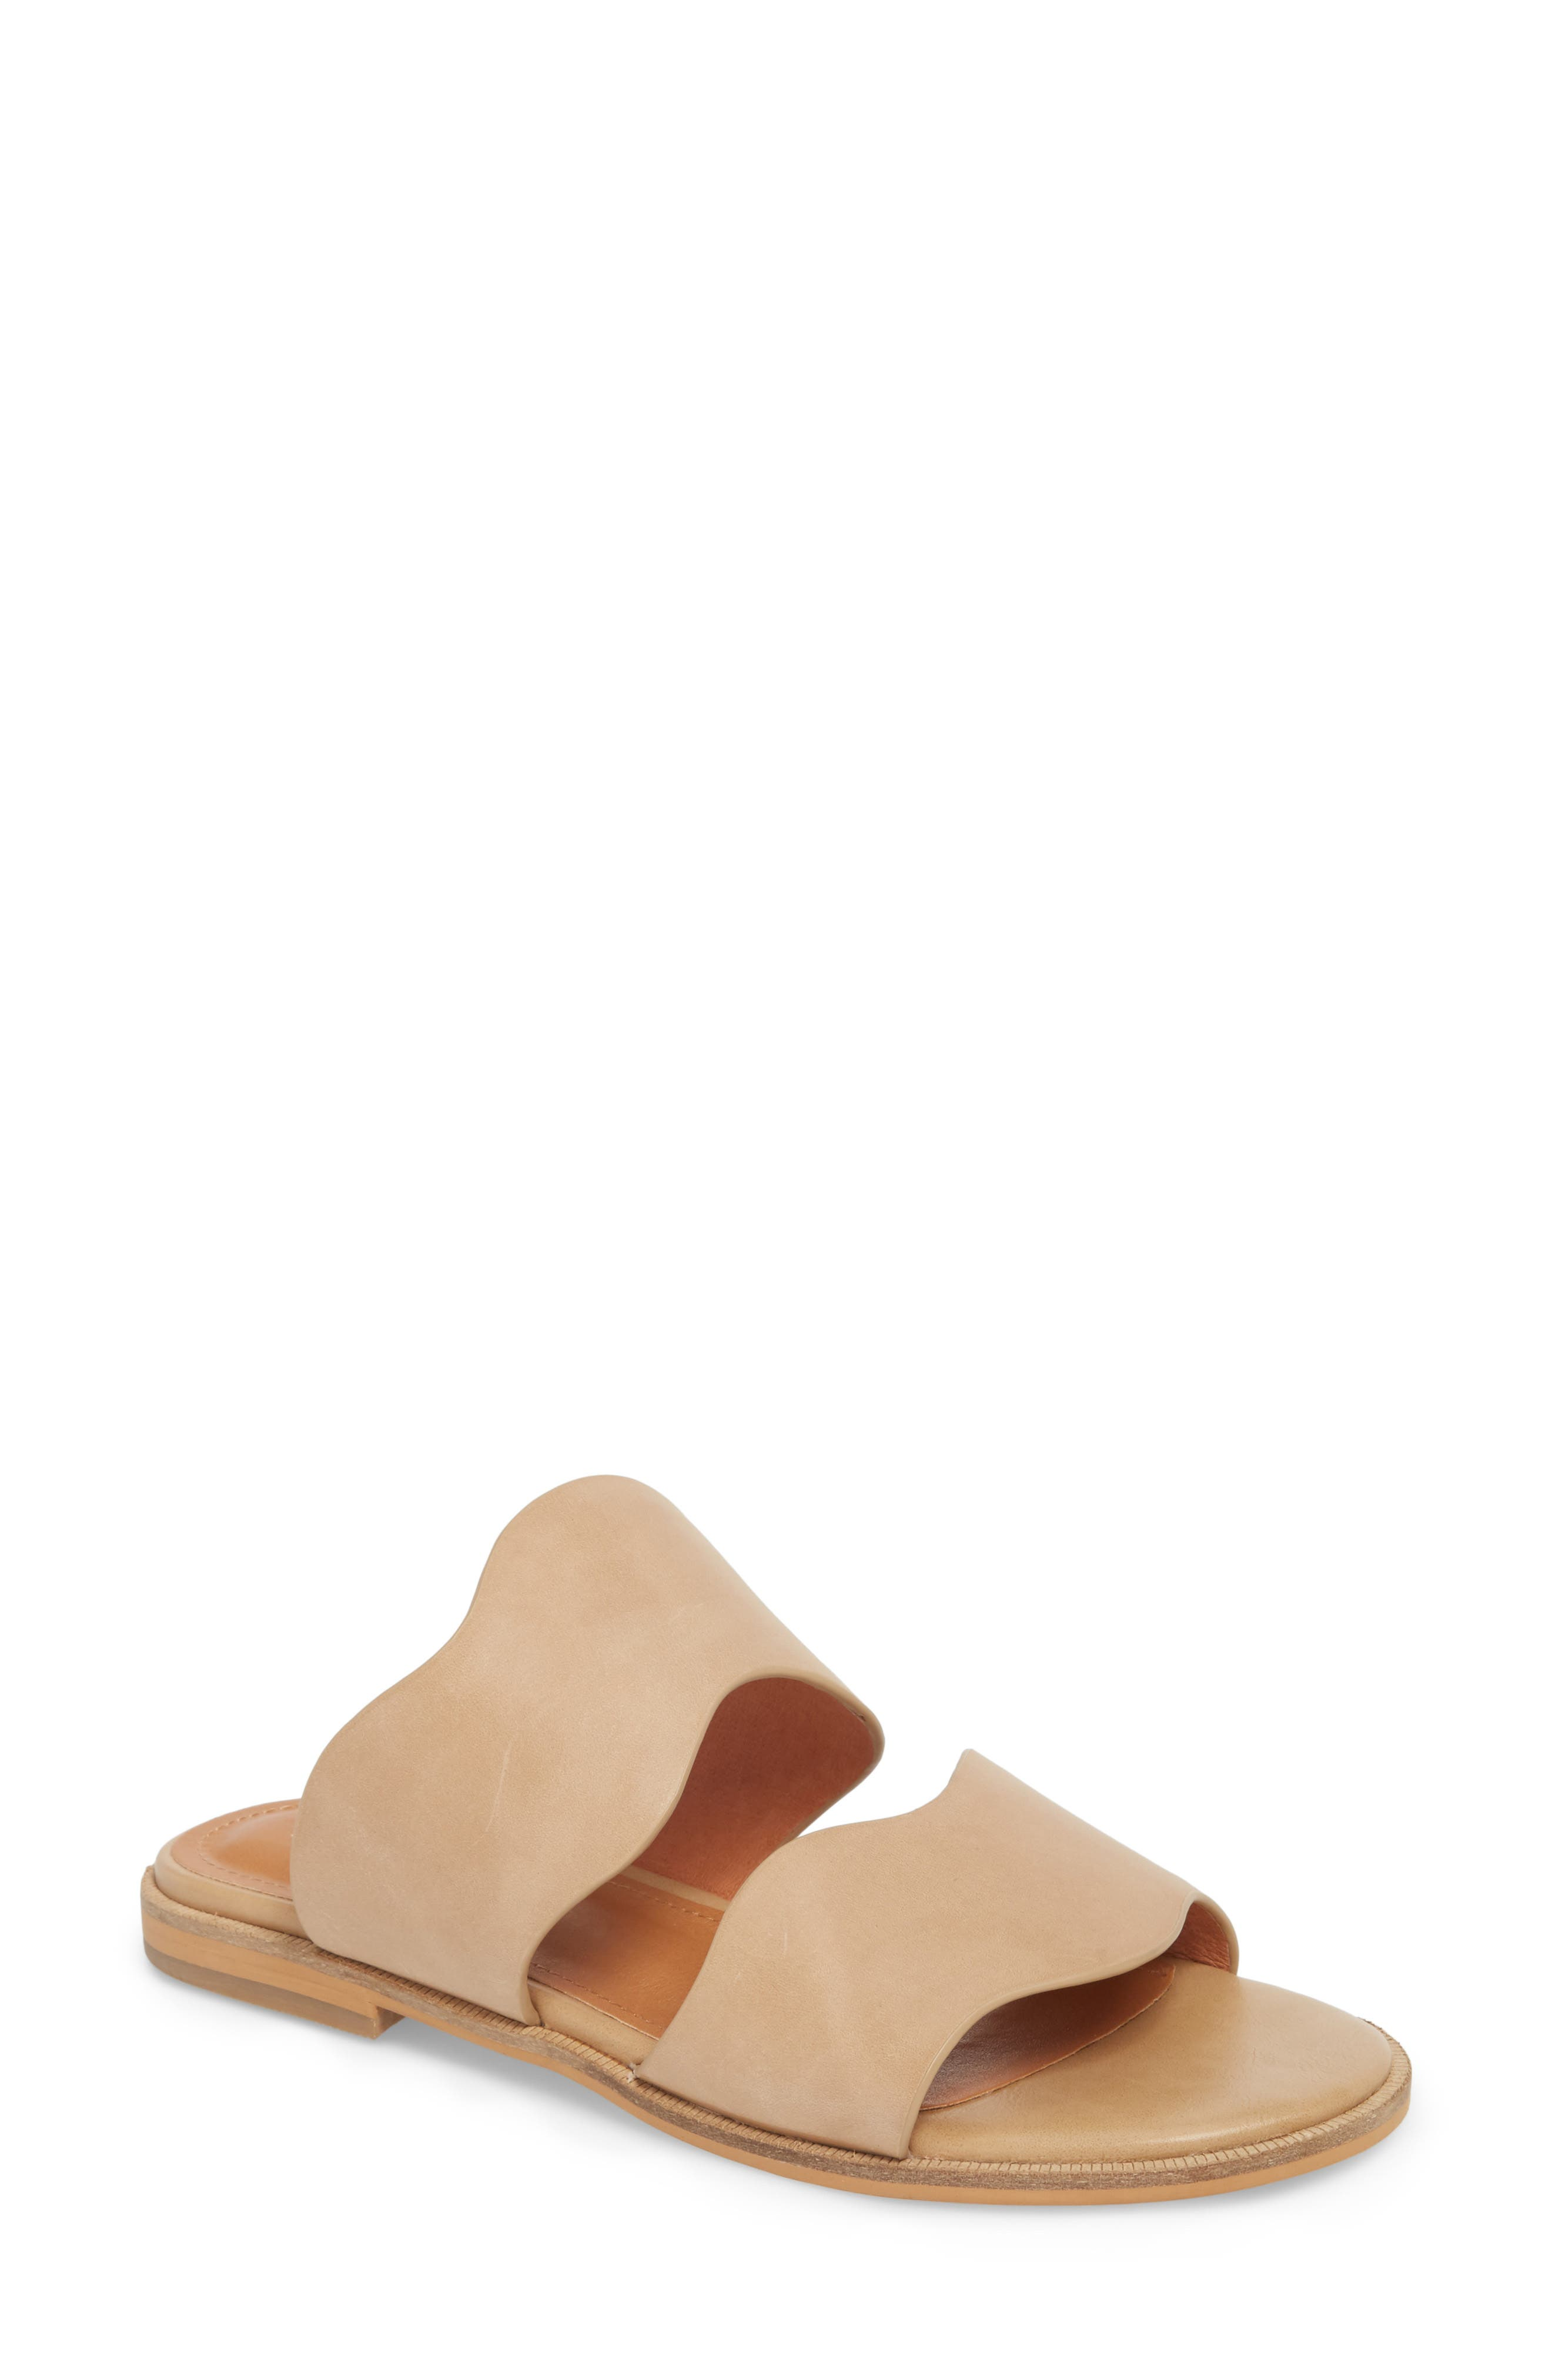 Thermos Scalloped Slide Sandal,                             Main thumbnail 1, color,                             250